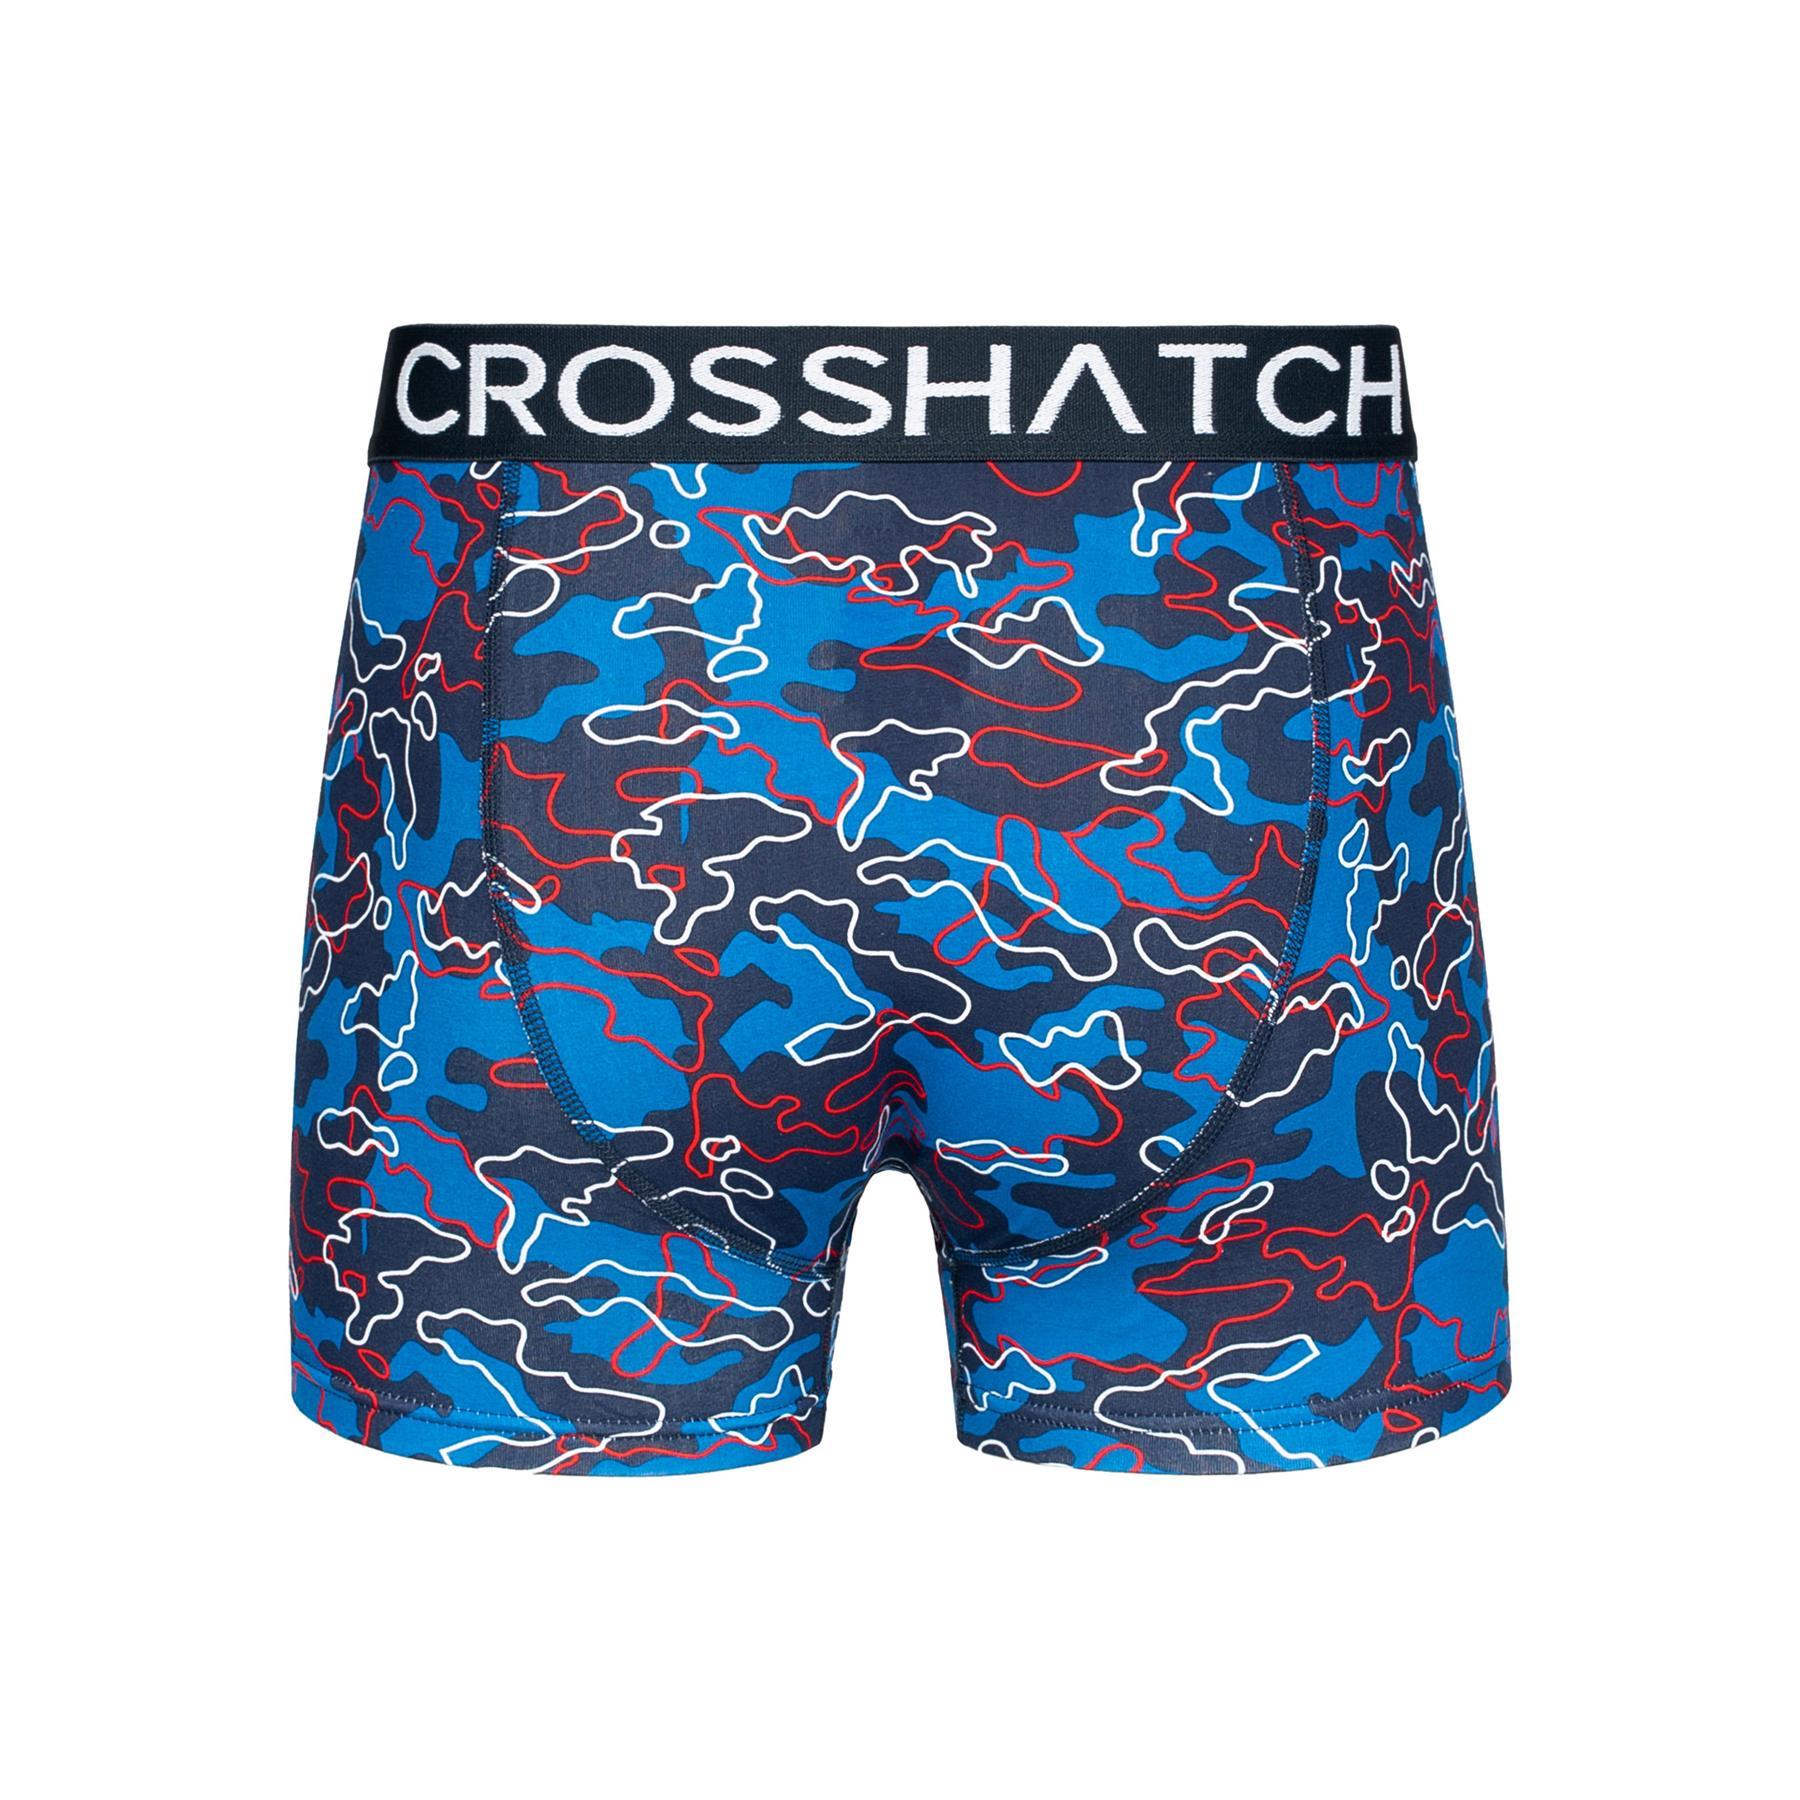 thumbnail 16 - Mens Crosshatch Boxers 3 Pack Shorts Underwear Trunks Underpants Multipack Sets